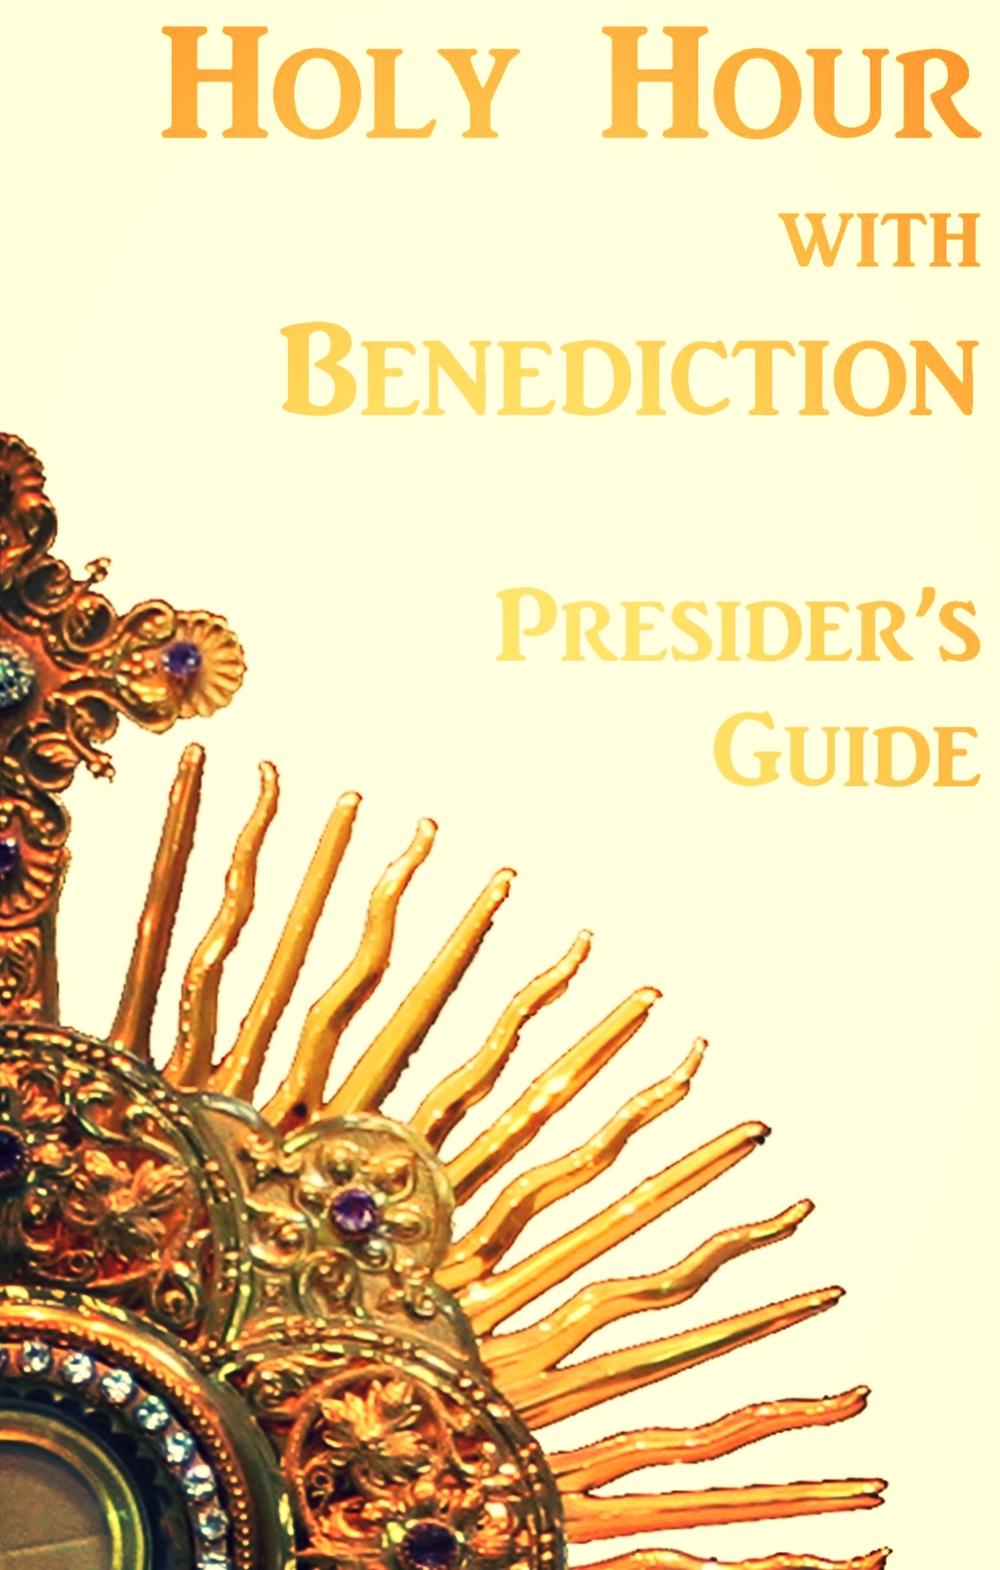 Presider's Guide for Adoration